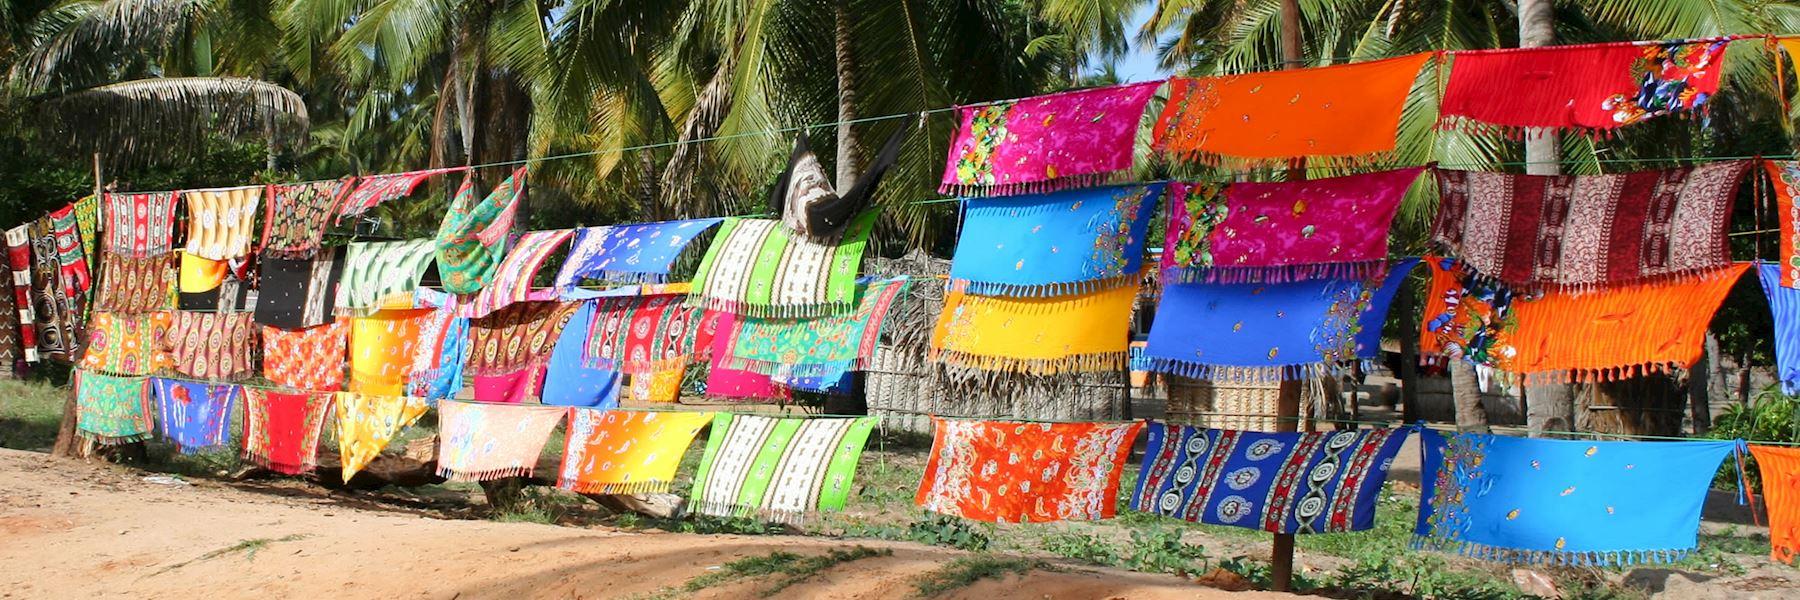 Mozambique vacations & safaris